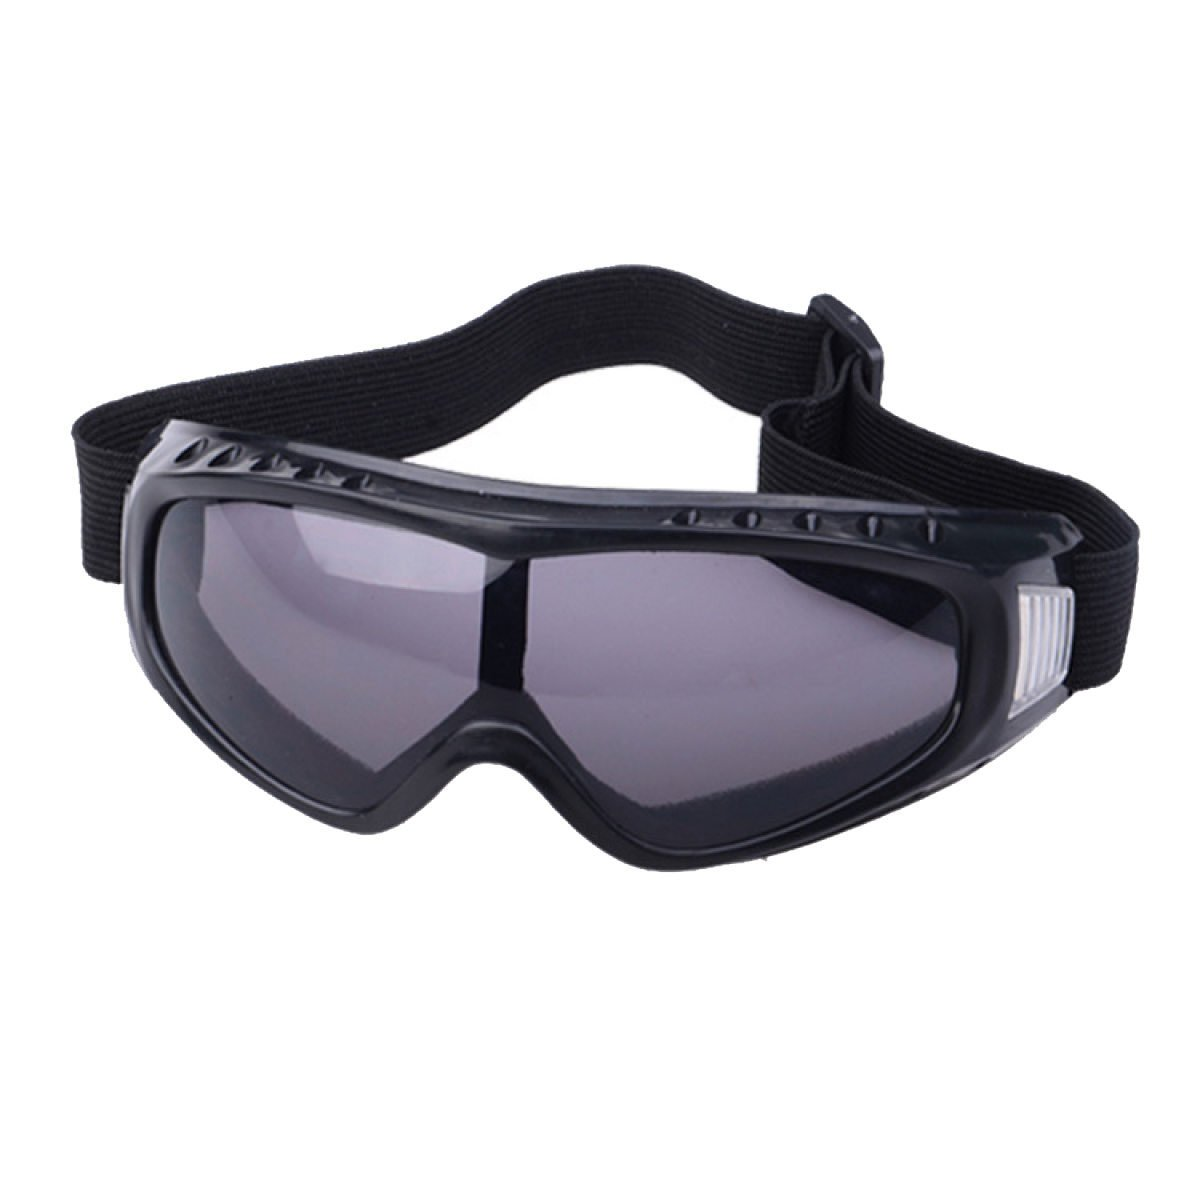 e96f2b35bee HD Climbing Goggles Fashion Ski Glasses Motorcycle Goggles